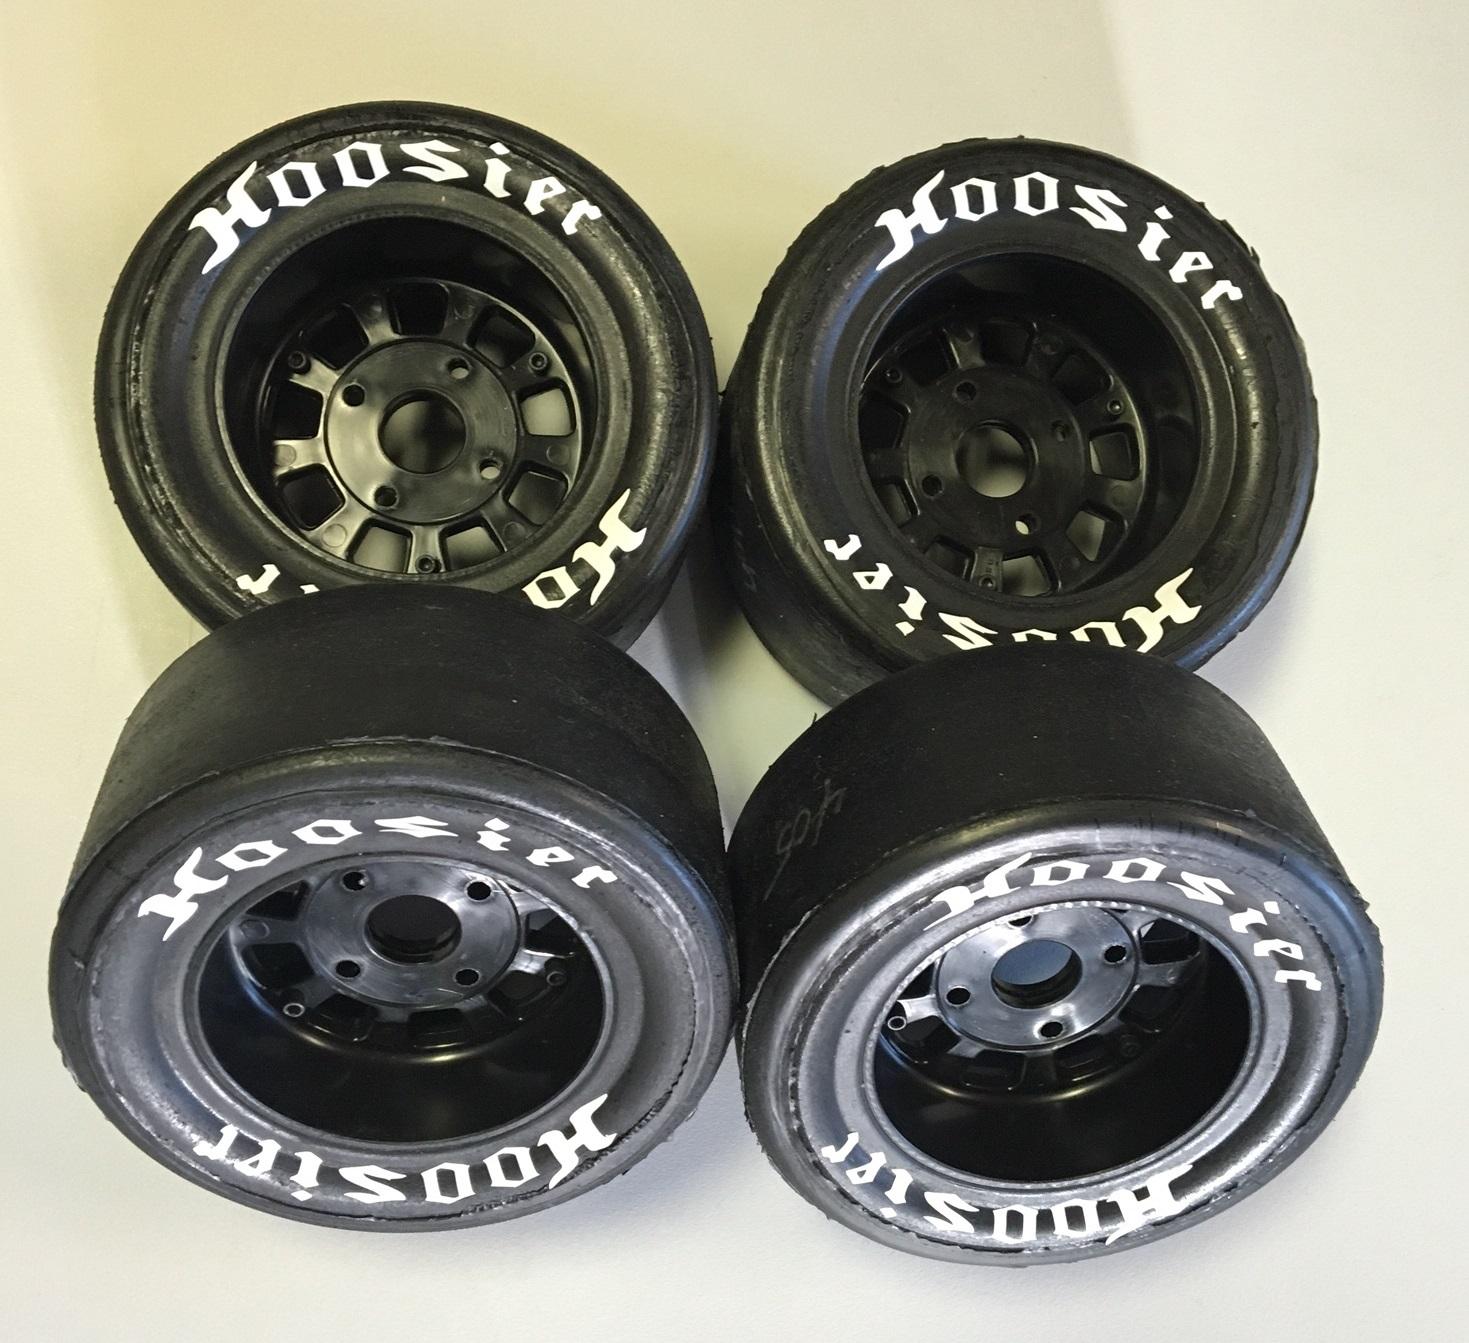 bishop racing tires, custom BRP wheels, Detroit Performance RC tires